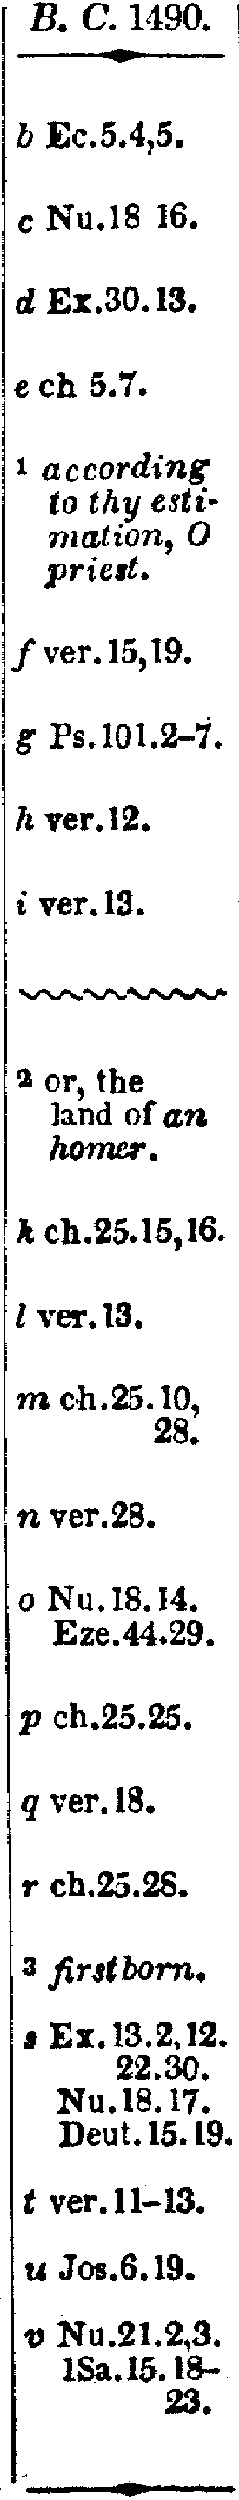 [merged small][ocr errors][merged small][ocr errors][merged small][merged small][ocr errors][merged small][ocr errors][merged small][merged small][merged small][merged small][ocr errors][ocr errors]